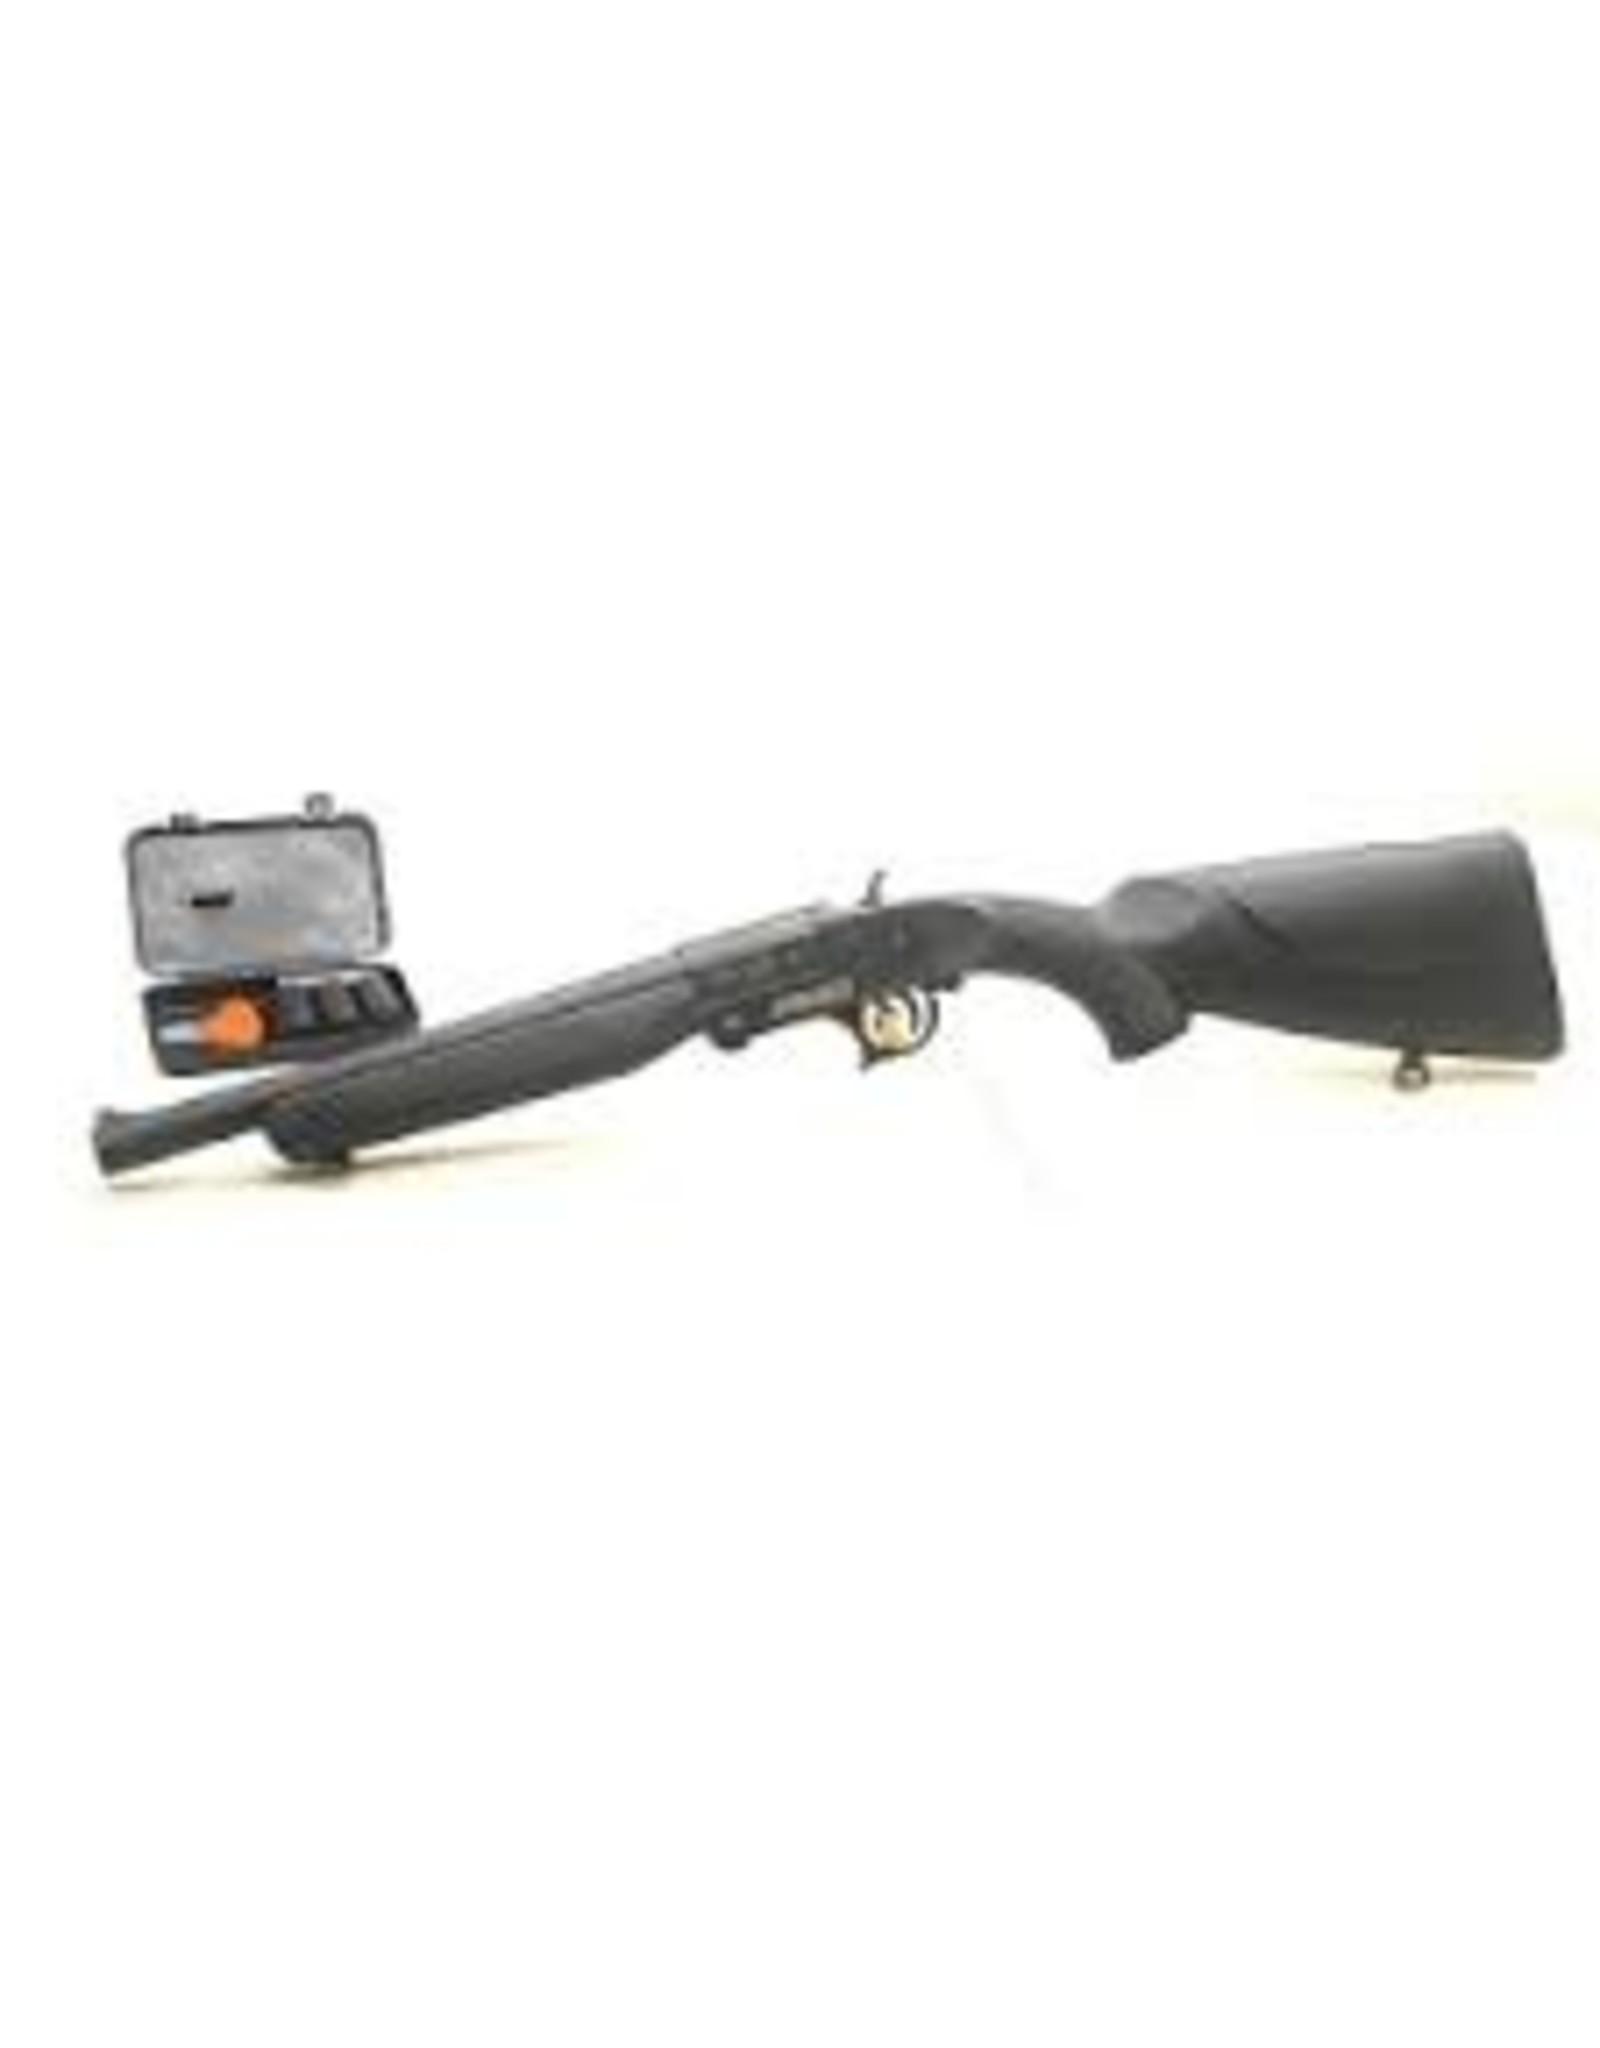 "Armed Armed SASH ""SHORTY"" 13″ Barrel 12 GA"